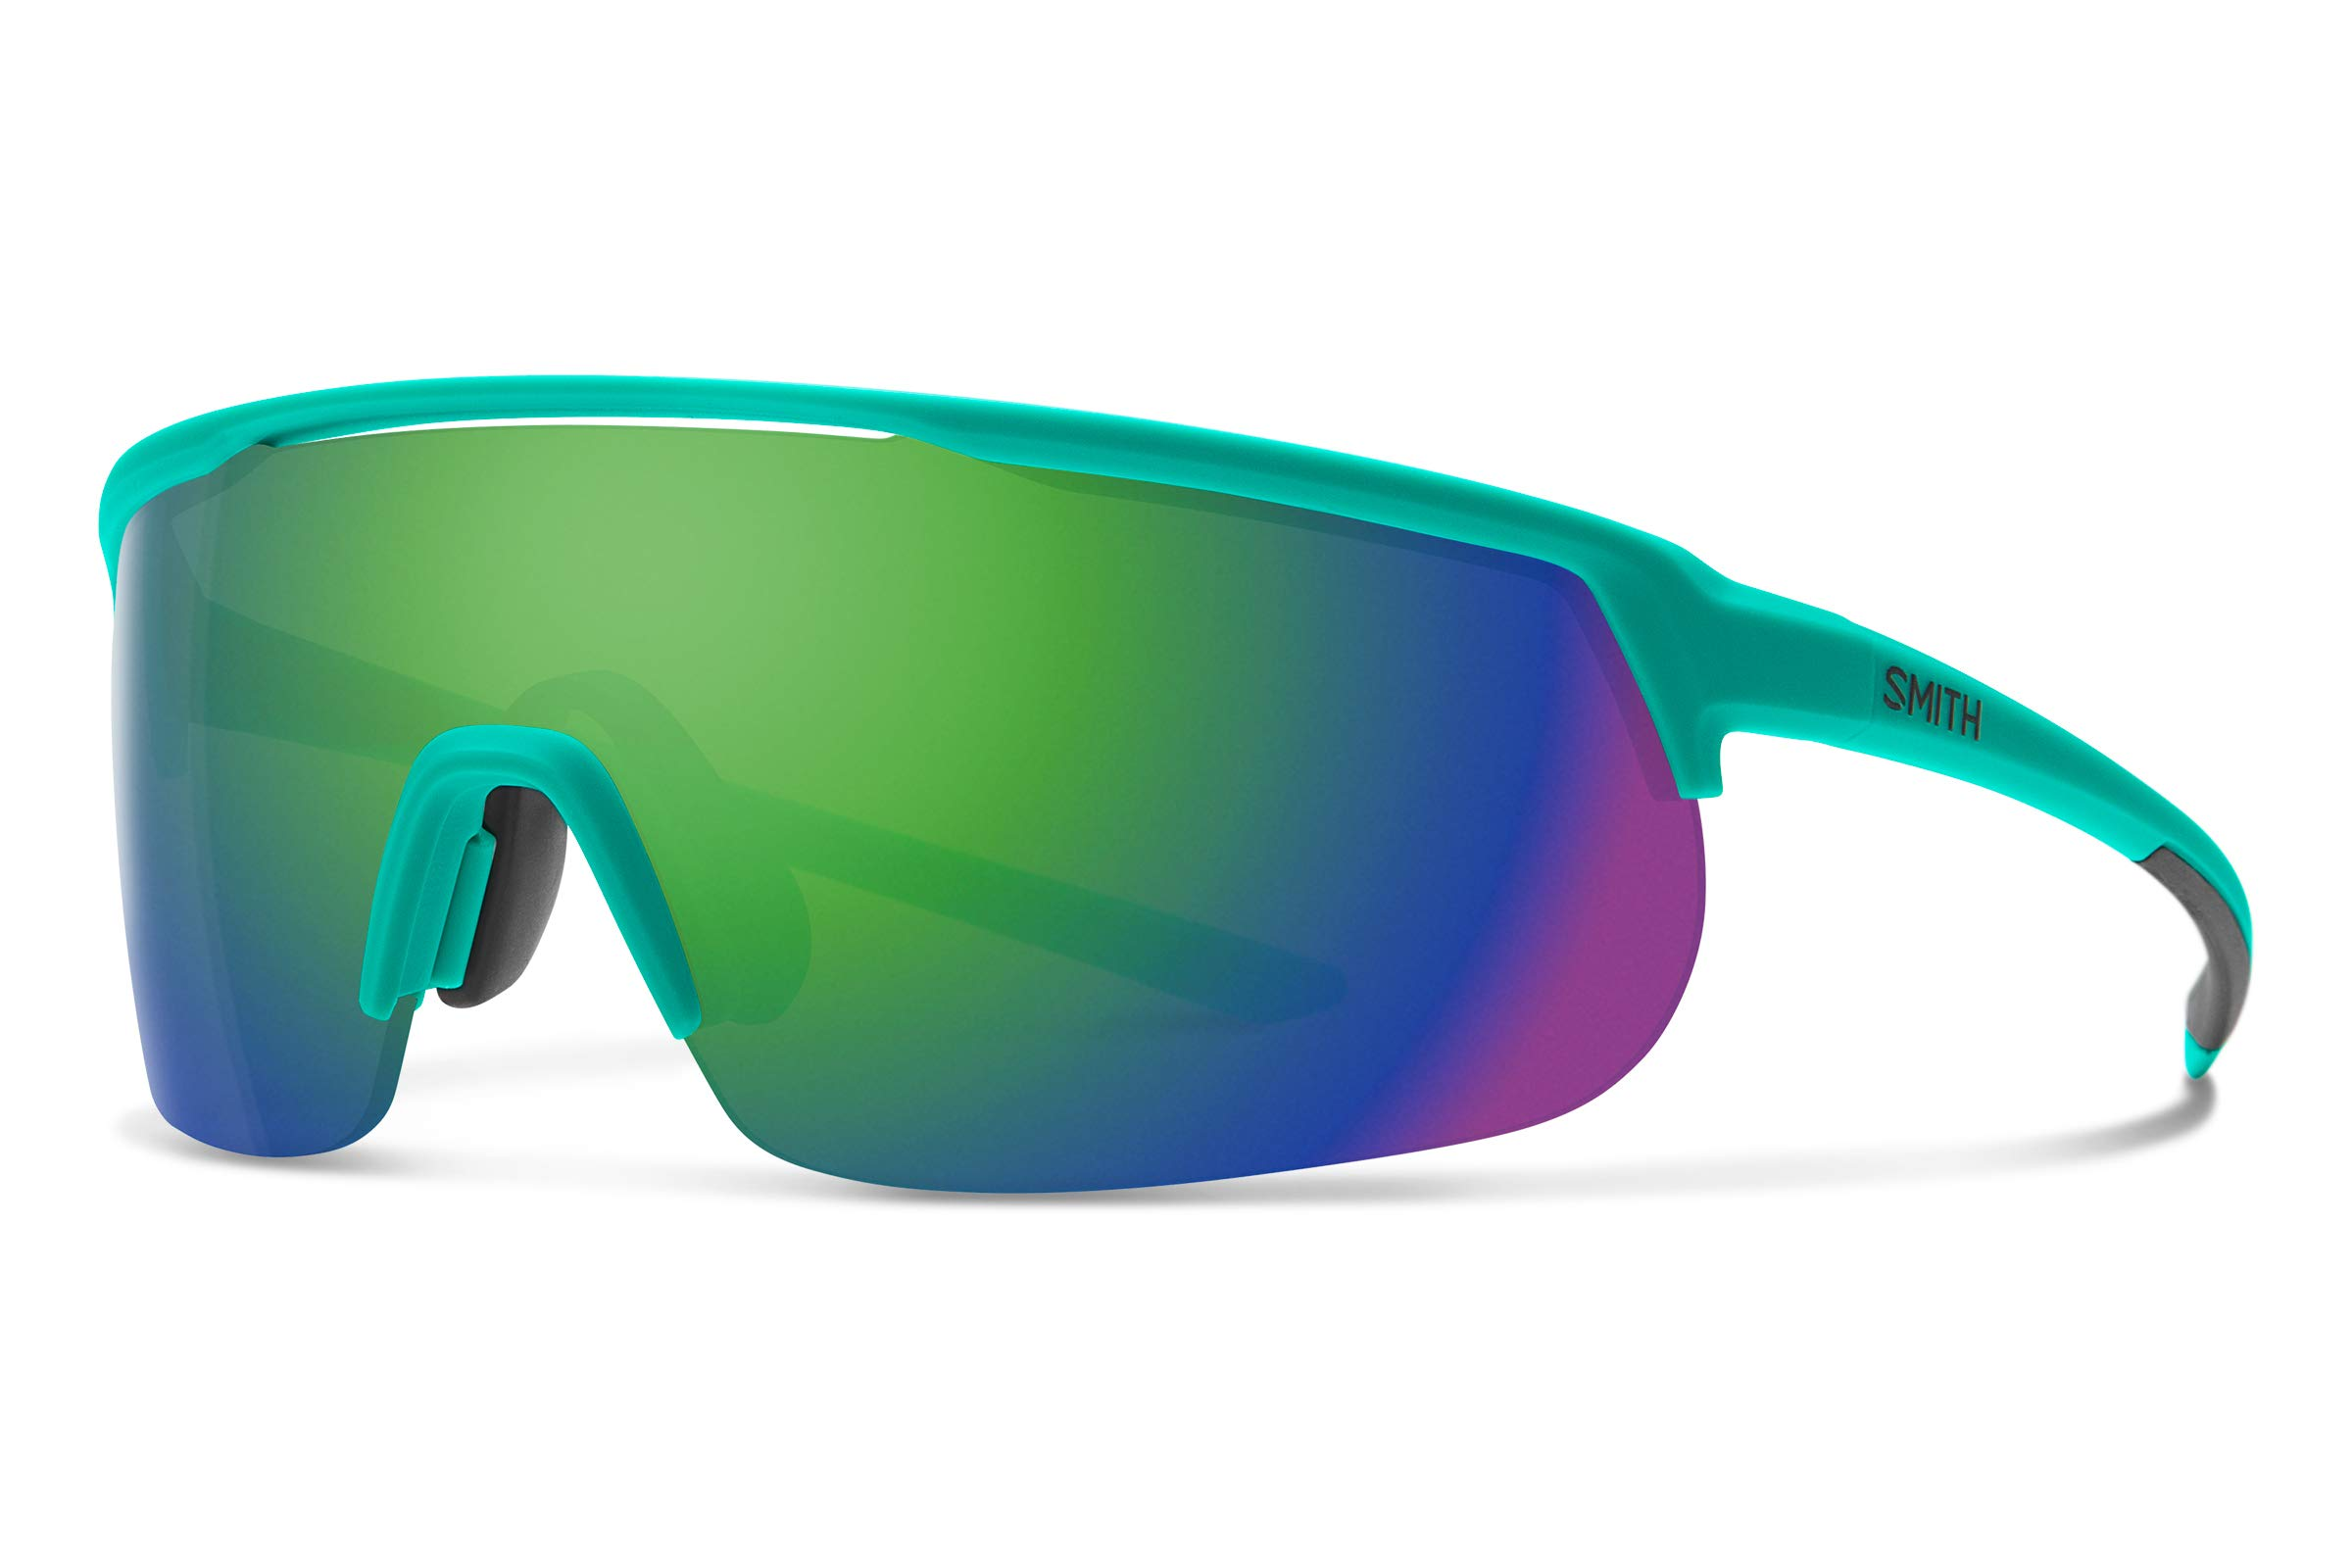 Smith Track Stand Chromapop Sunglasses, Matte Jade, Chromapop Sun Green Mirror/Contrast Rose